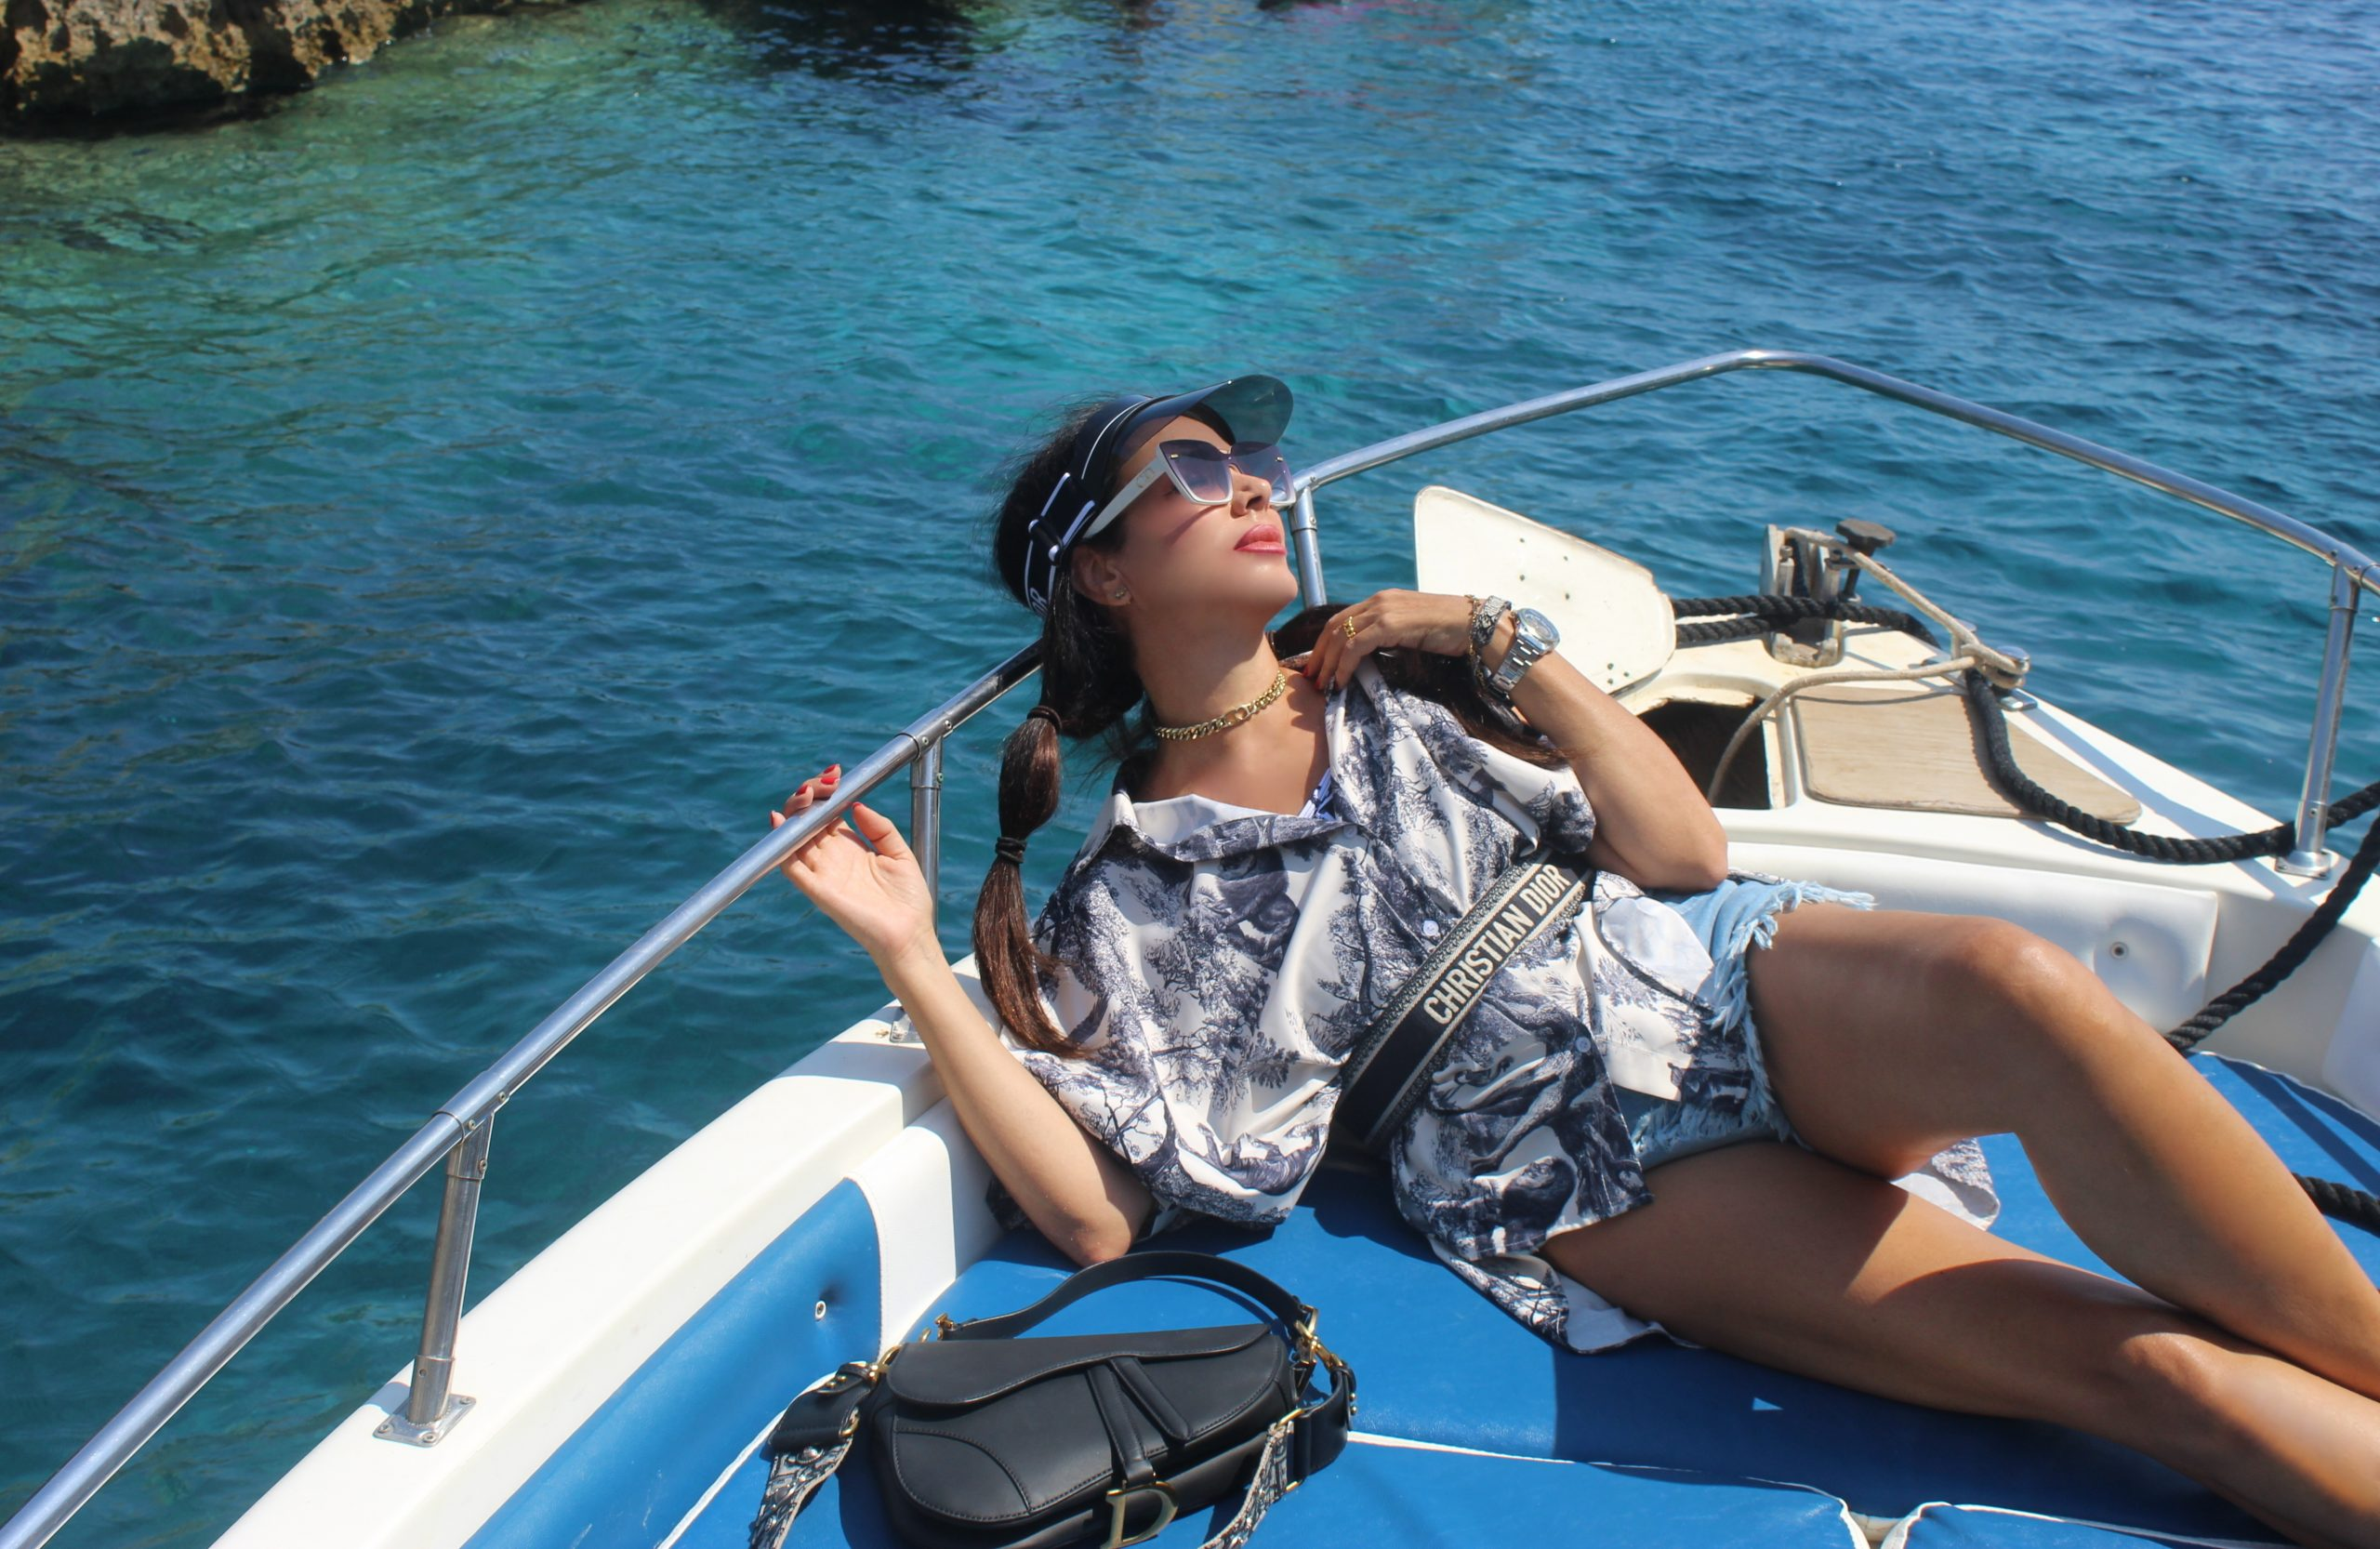 Italy on air Tremiti Elicopter Elicottero Isole Tremiti Puglia Gargano Molise VitirTremiti VisitItaly Dior Beachwear Lookbook